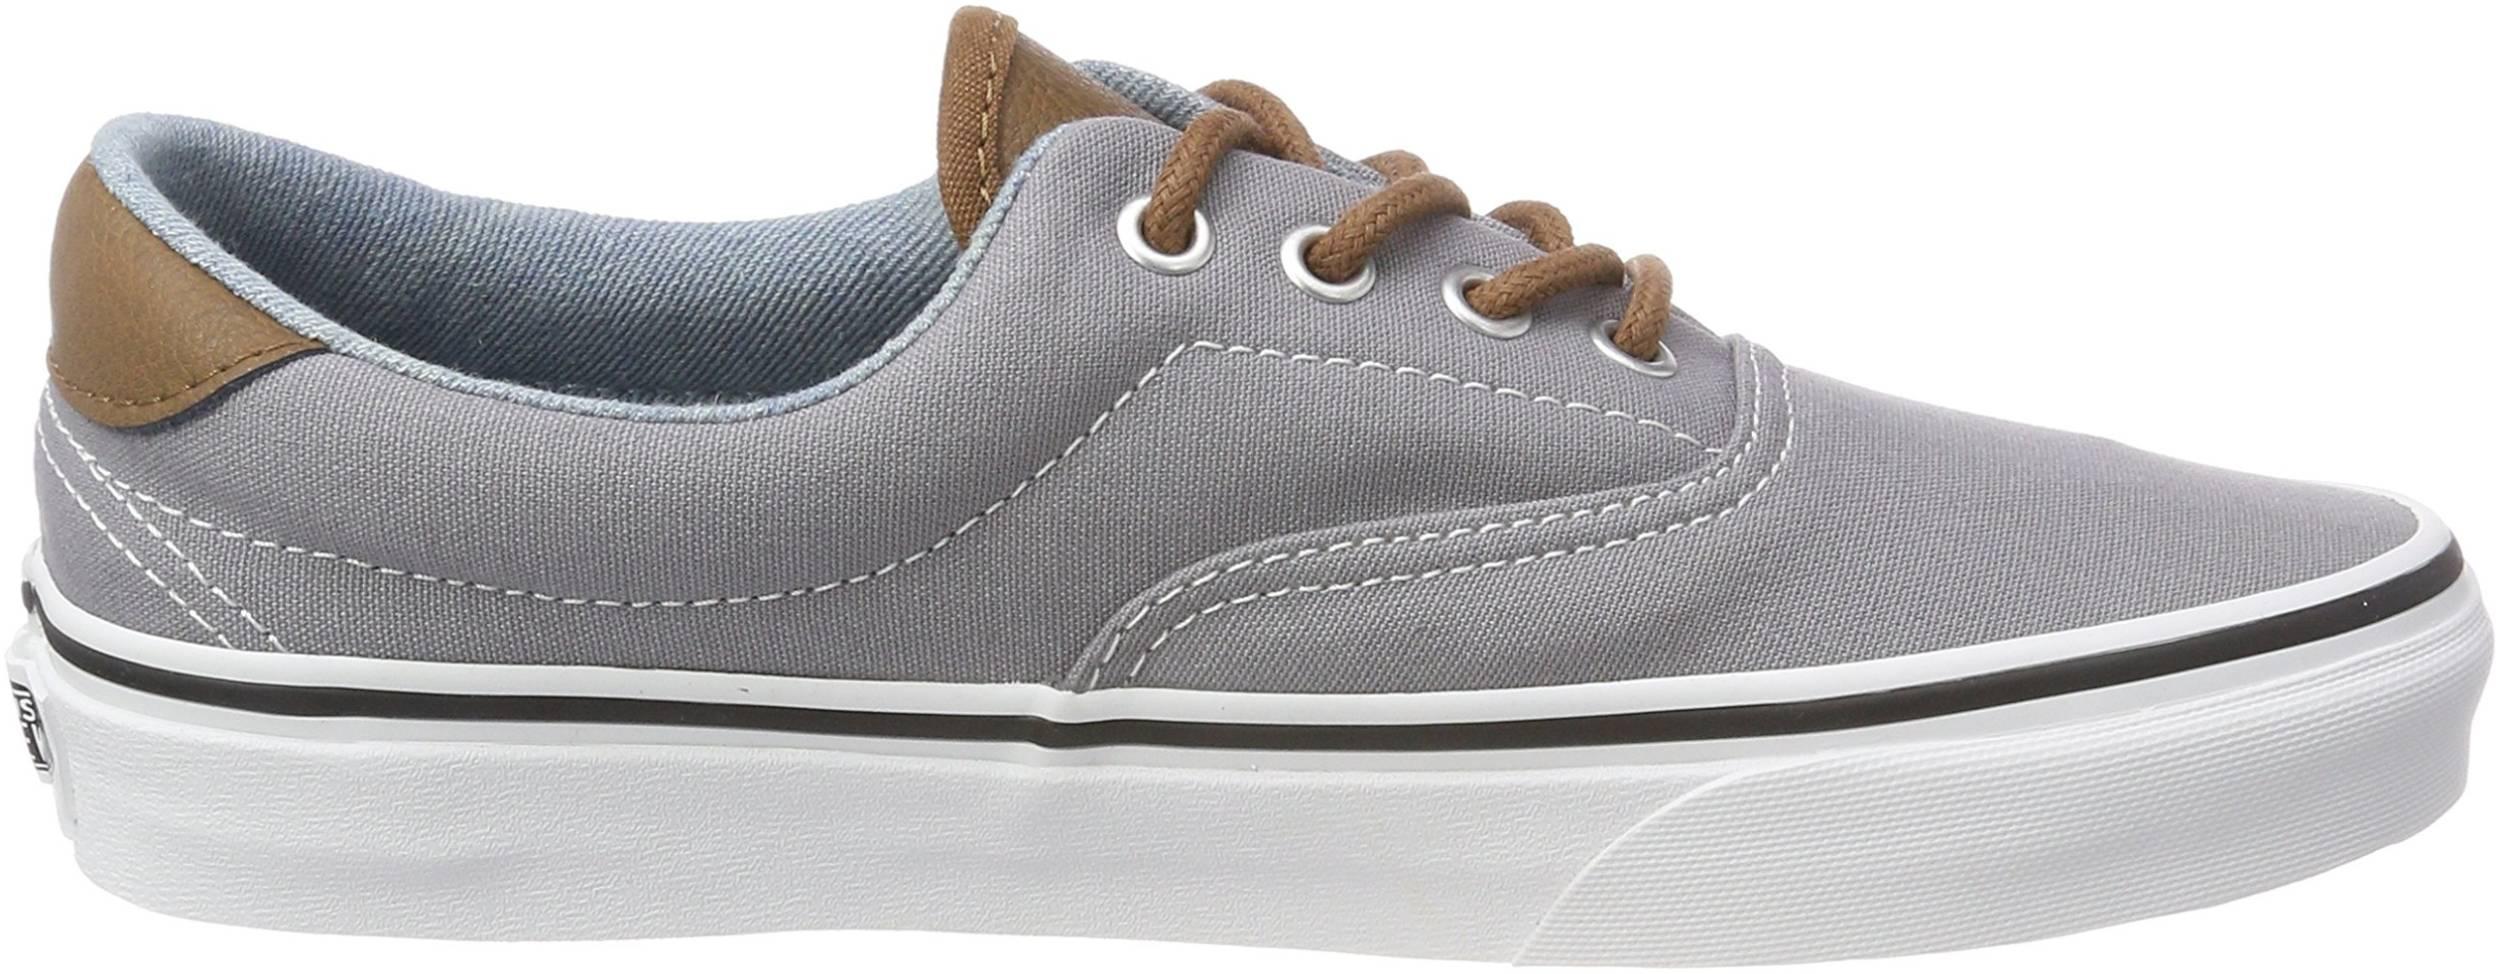 Vans Era 59 sneakers (only $31) | RunRepeat